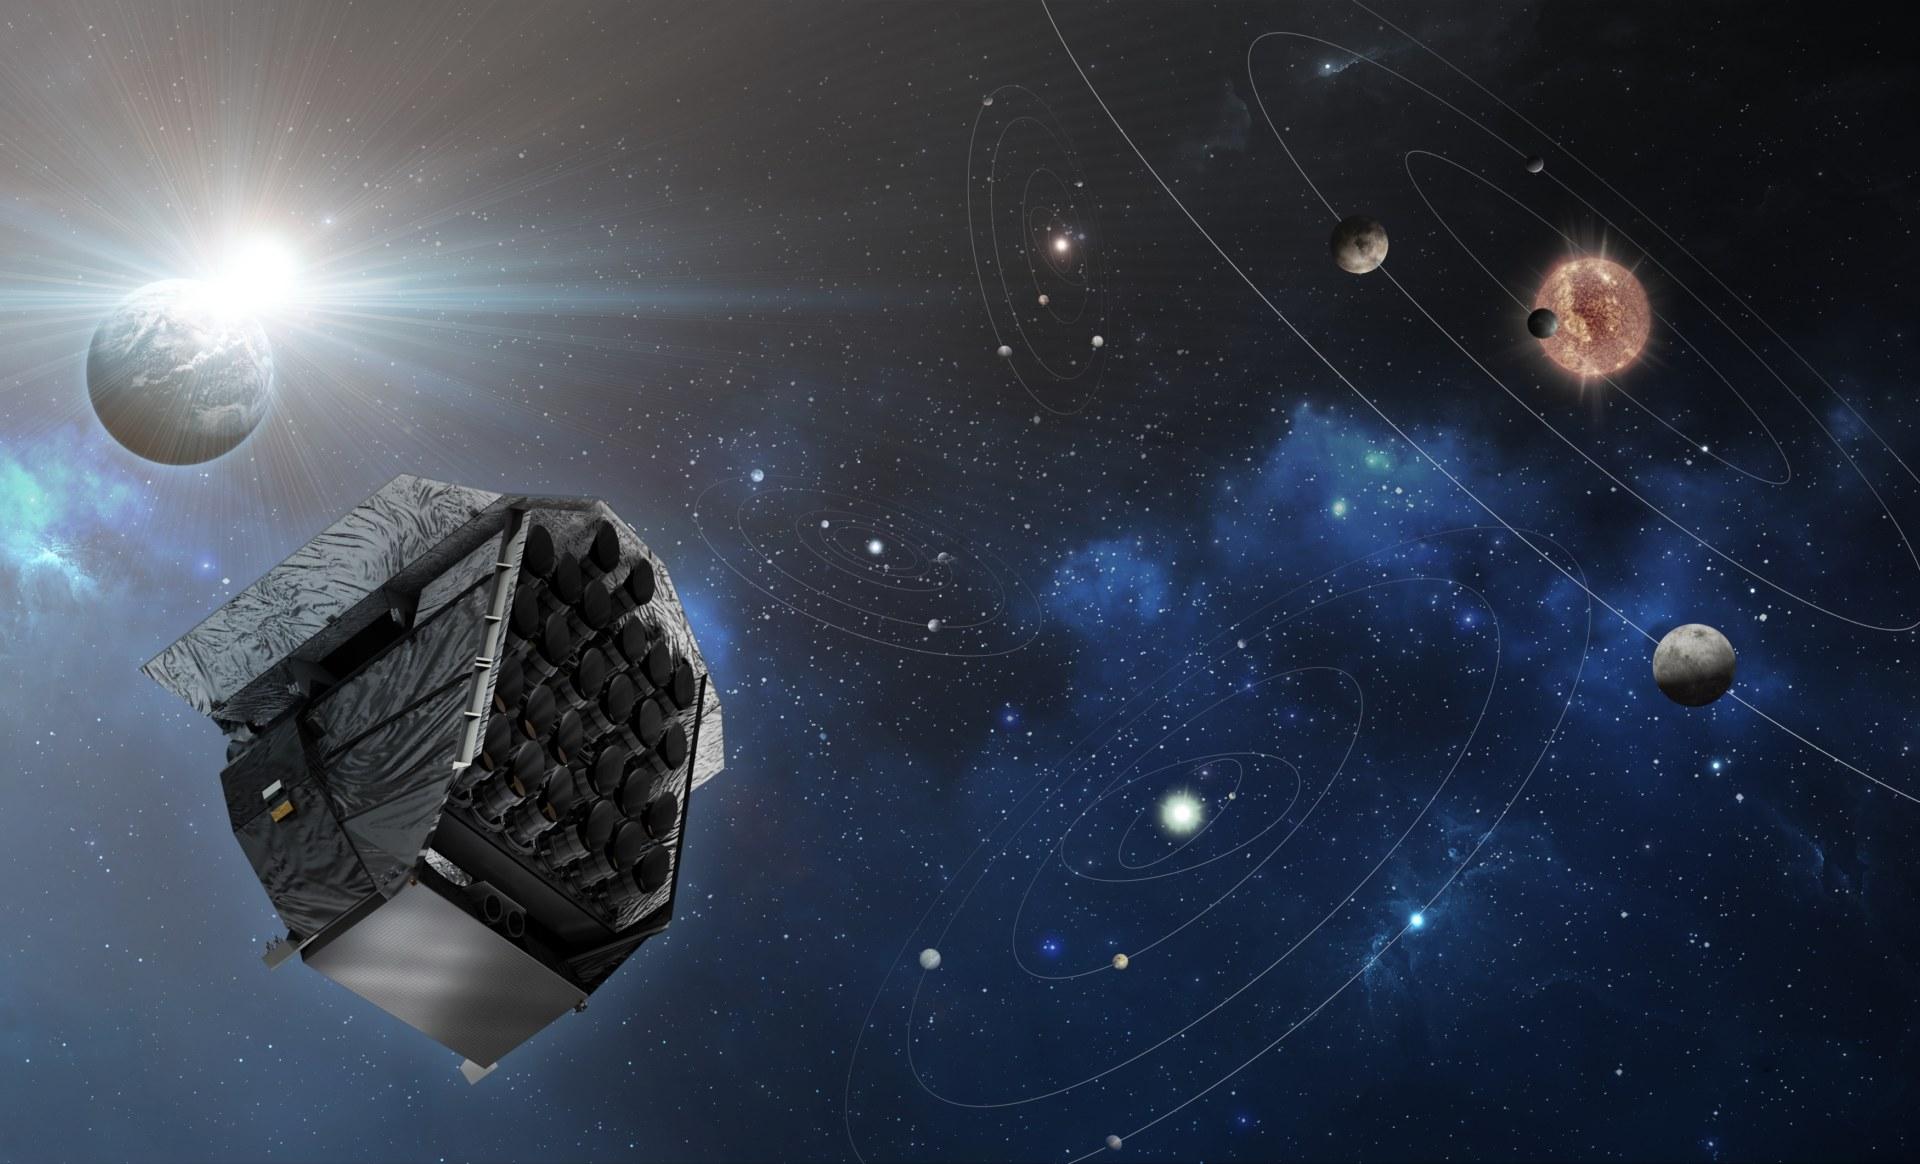 PLATO-Satellite-in-space_artist_s-impression_(c)_OHB-System-AG